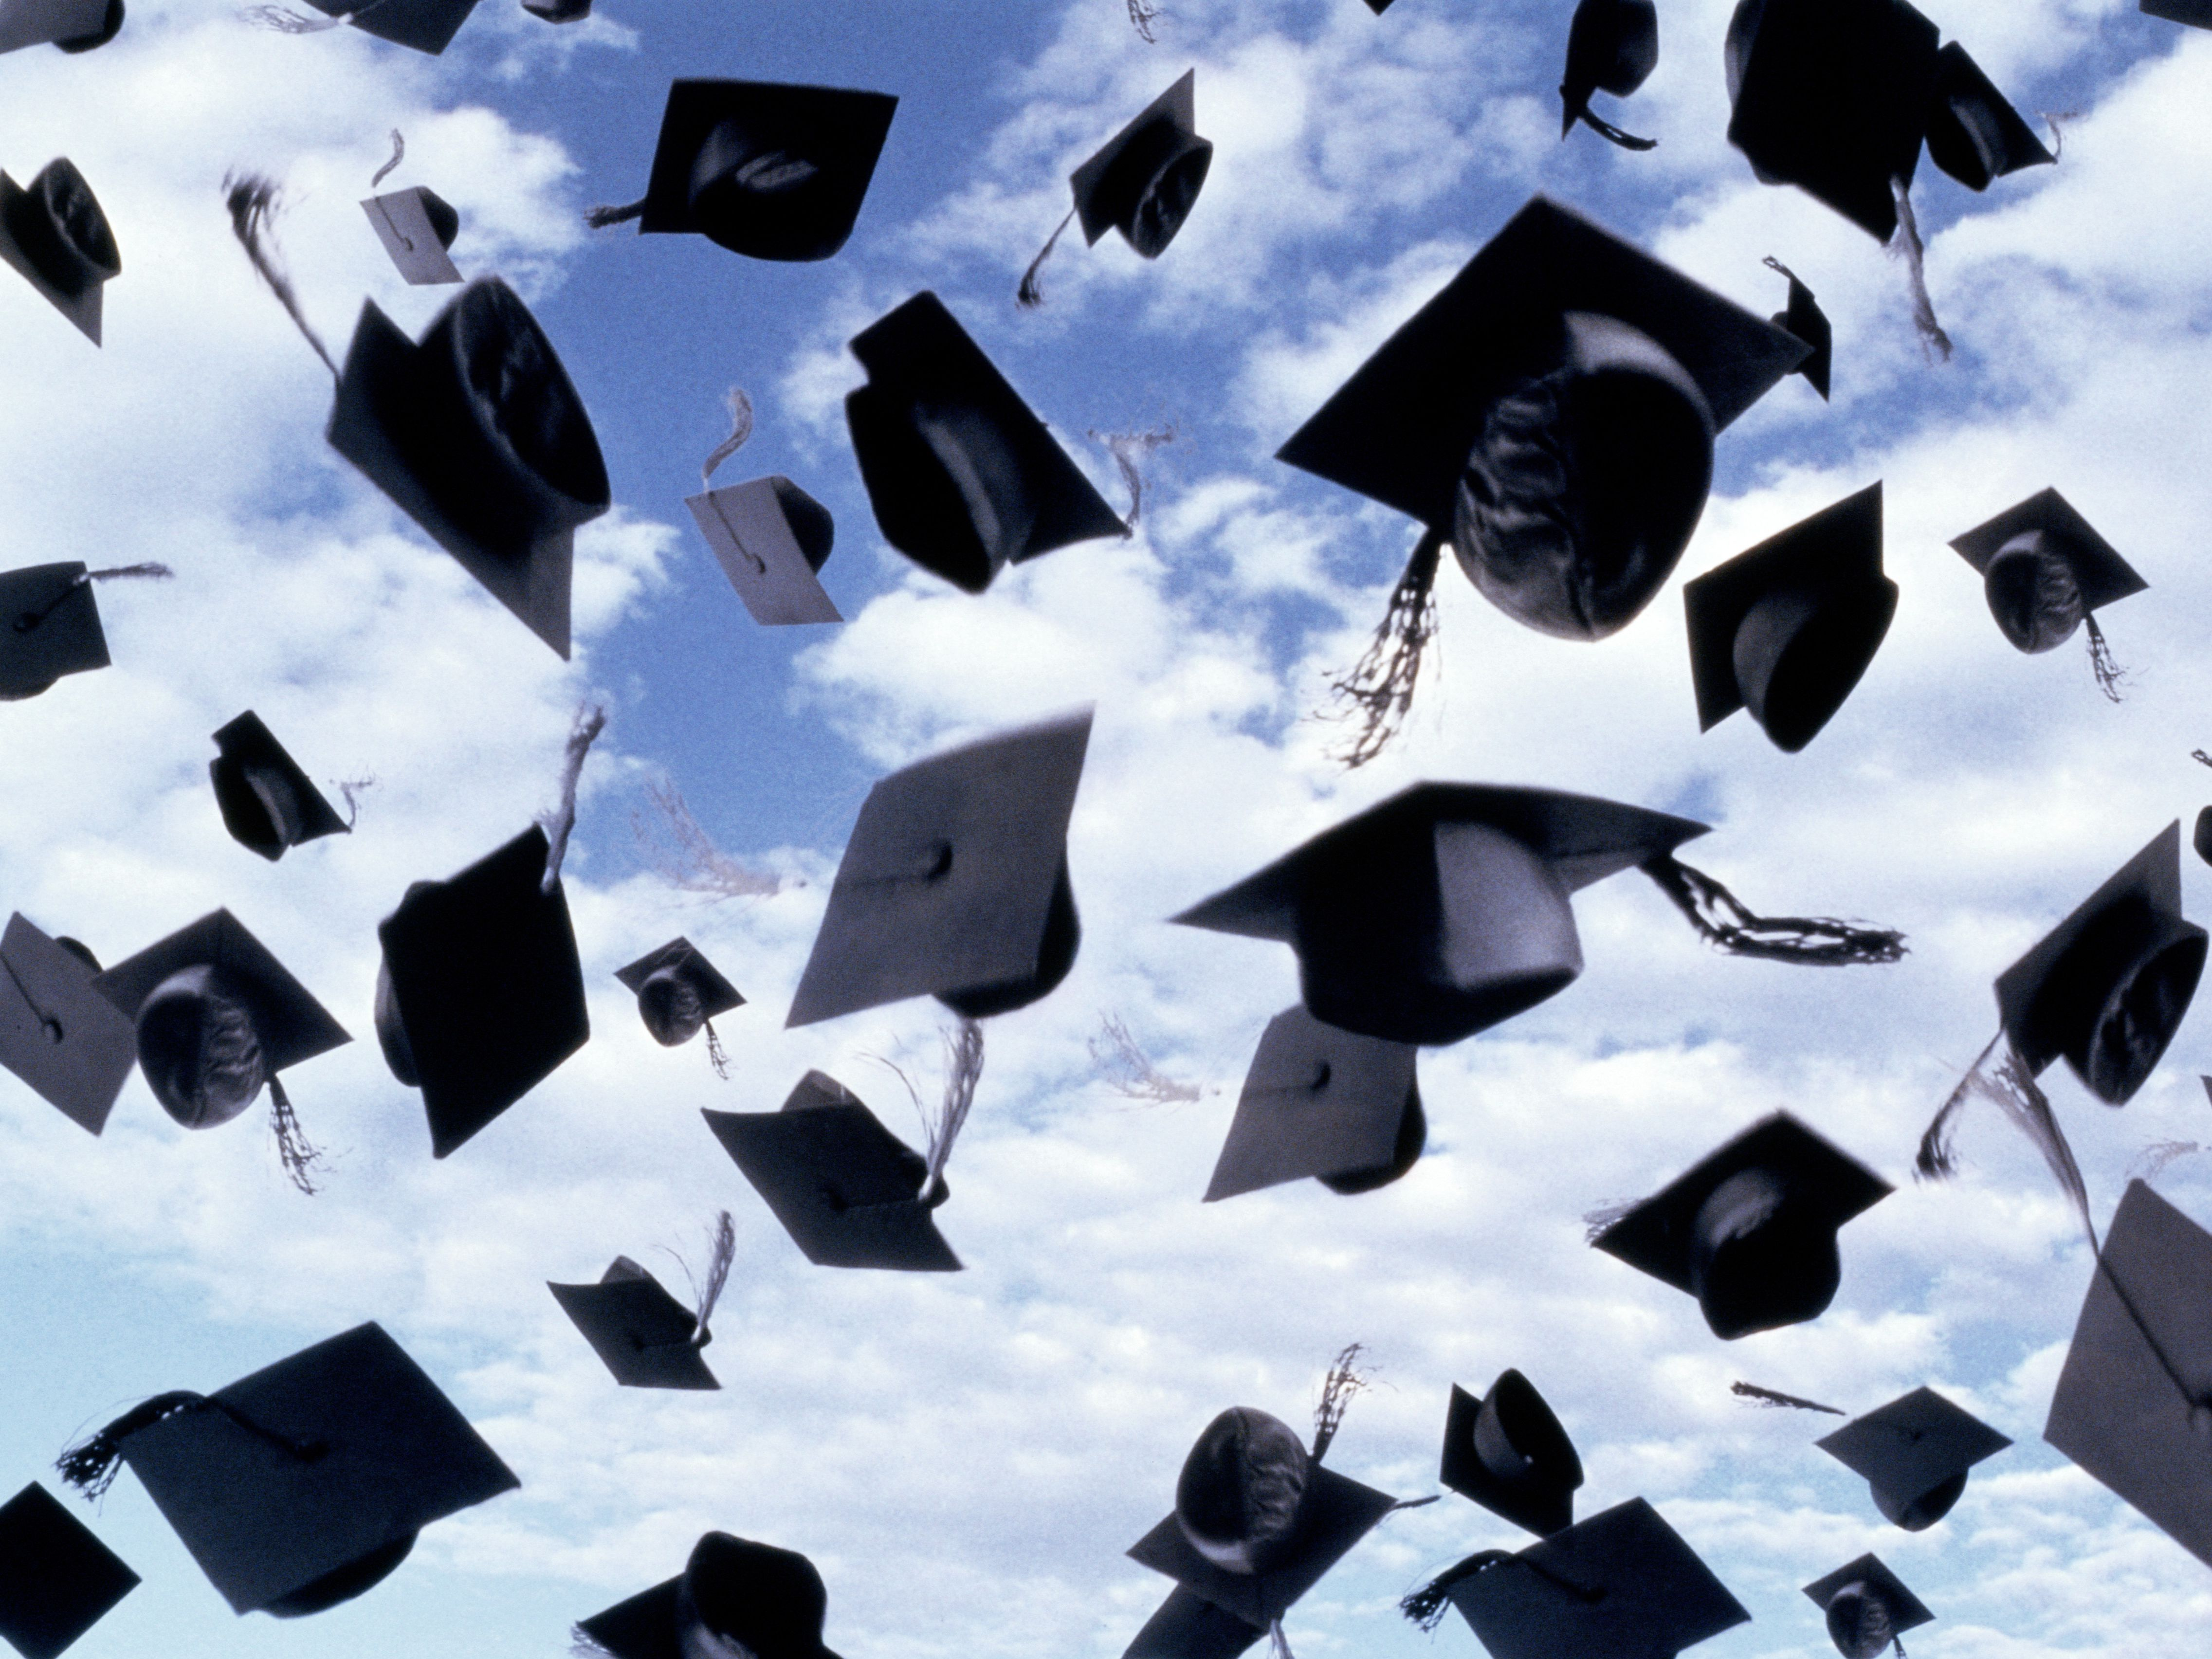 Top Ten Themes for Graduation Speeches